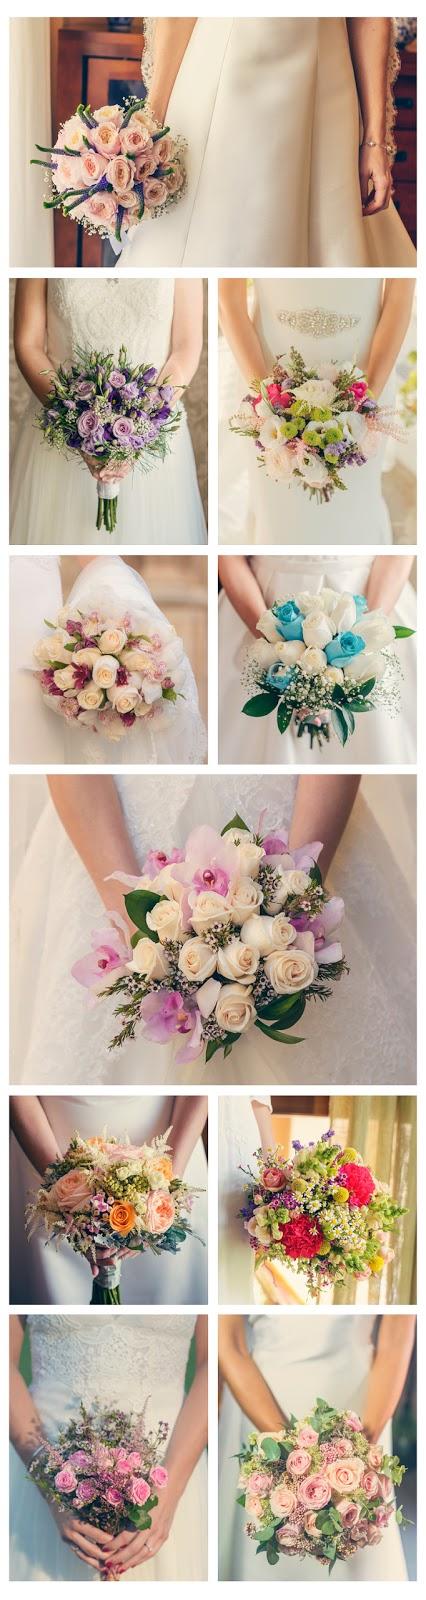 Ramos de novia detalles para una boda perfecta francisco n merino - Detalles para una boda perfecta ...